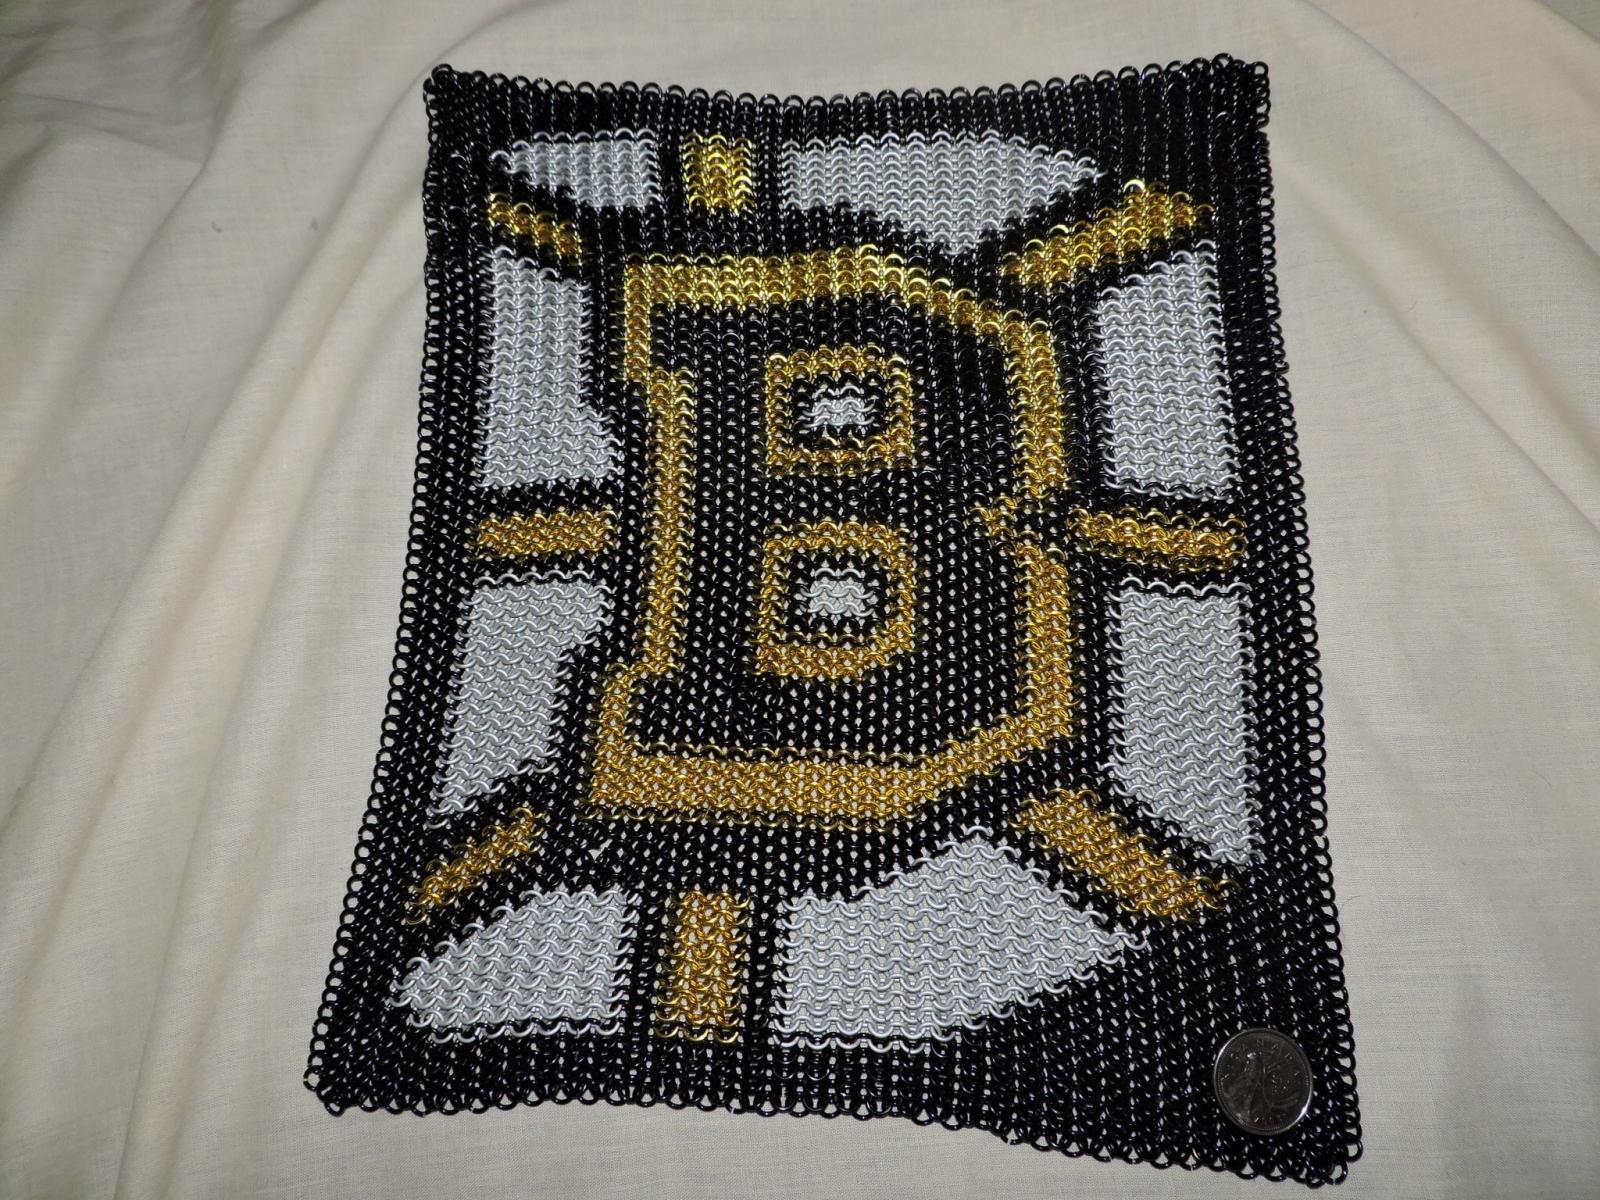 Boston Bruins inlay